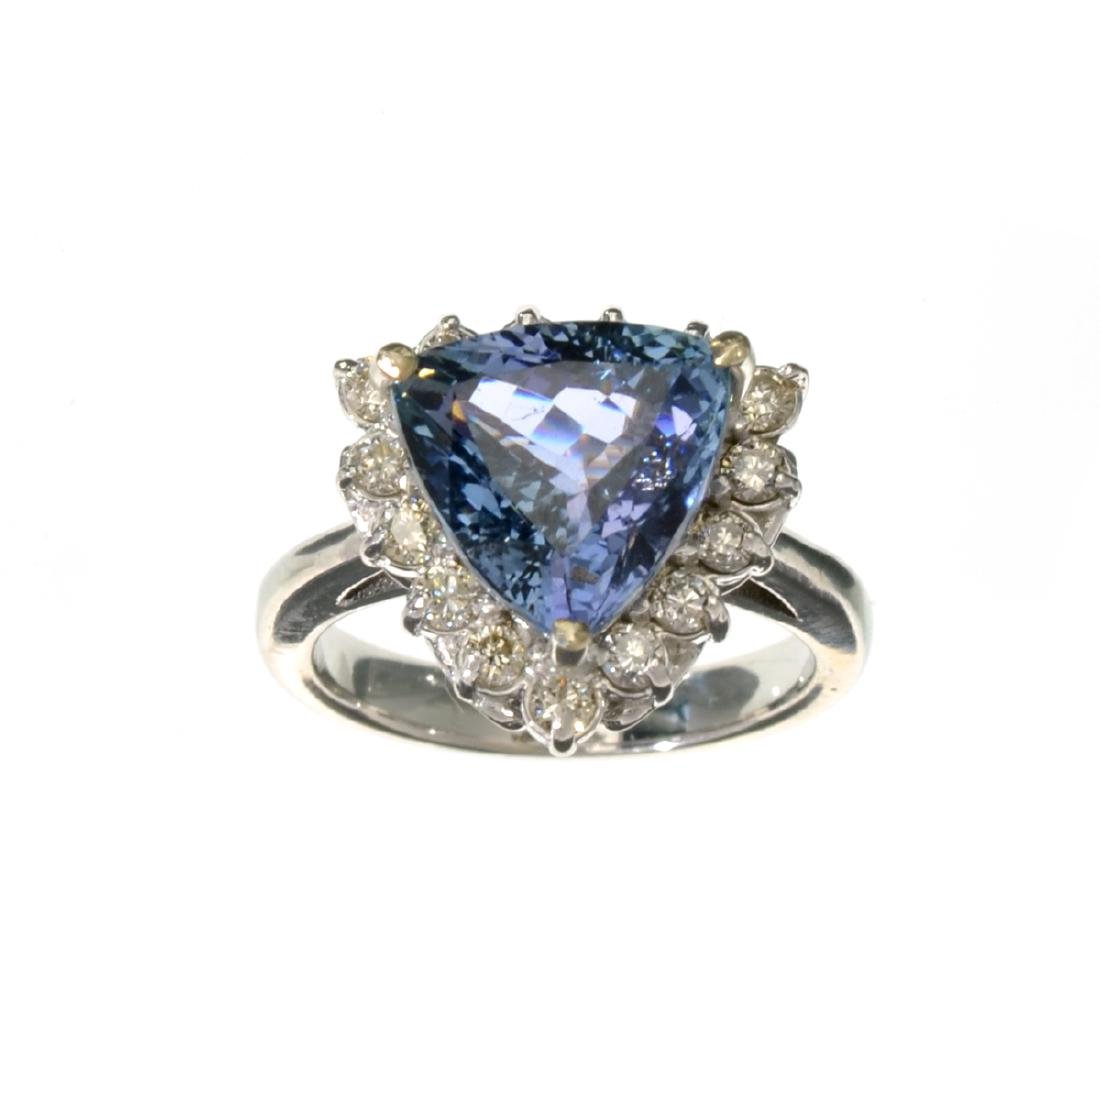 APP: 11.1k Fine Jewelry 14kt White Gold, 5.15CT